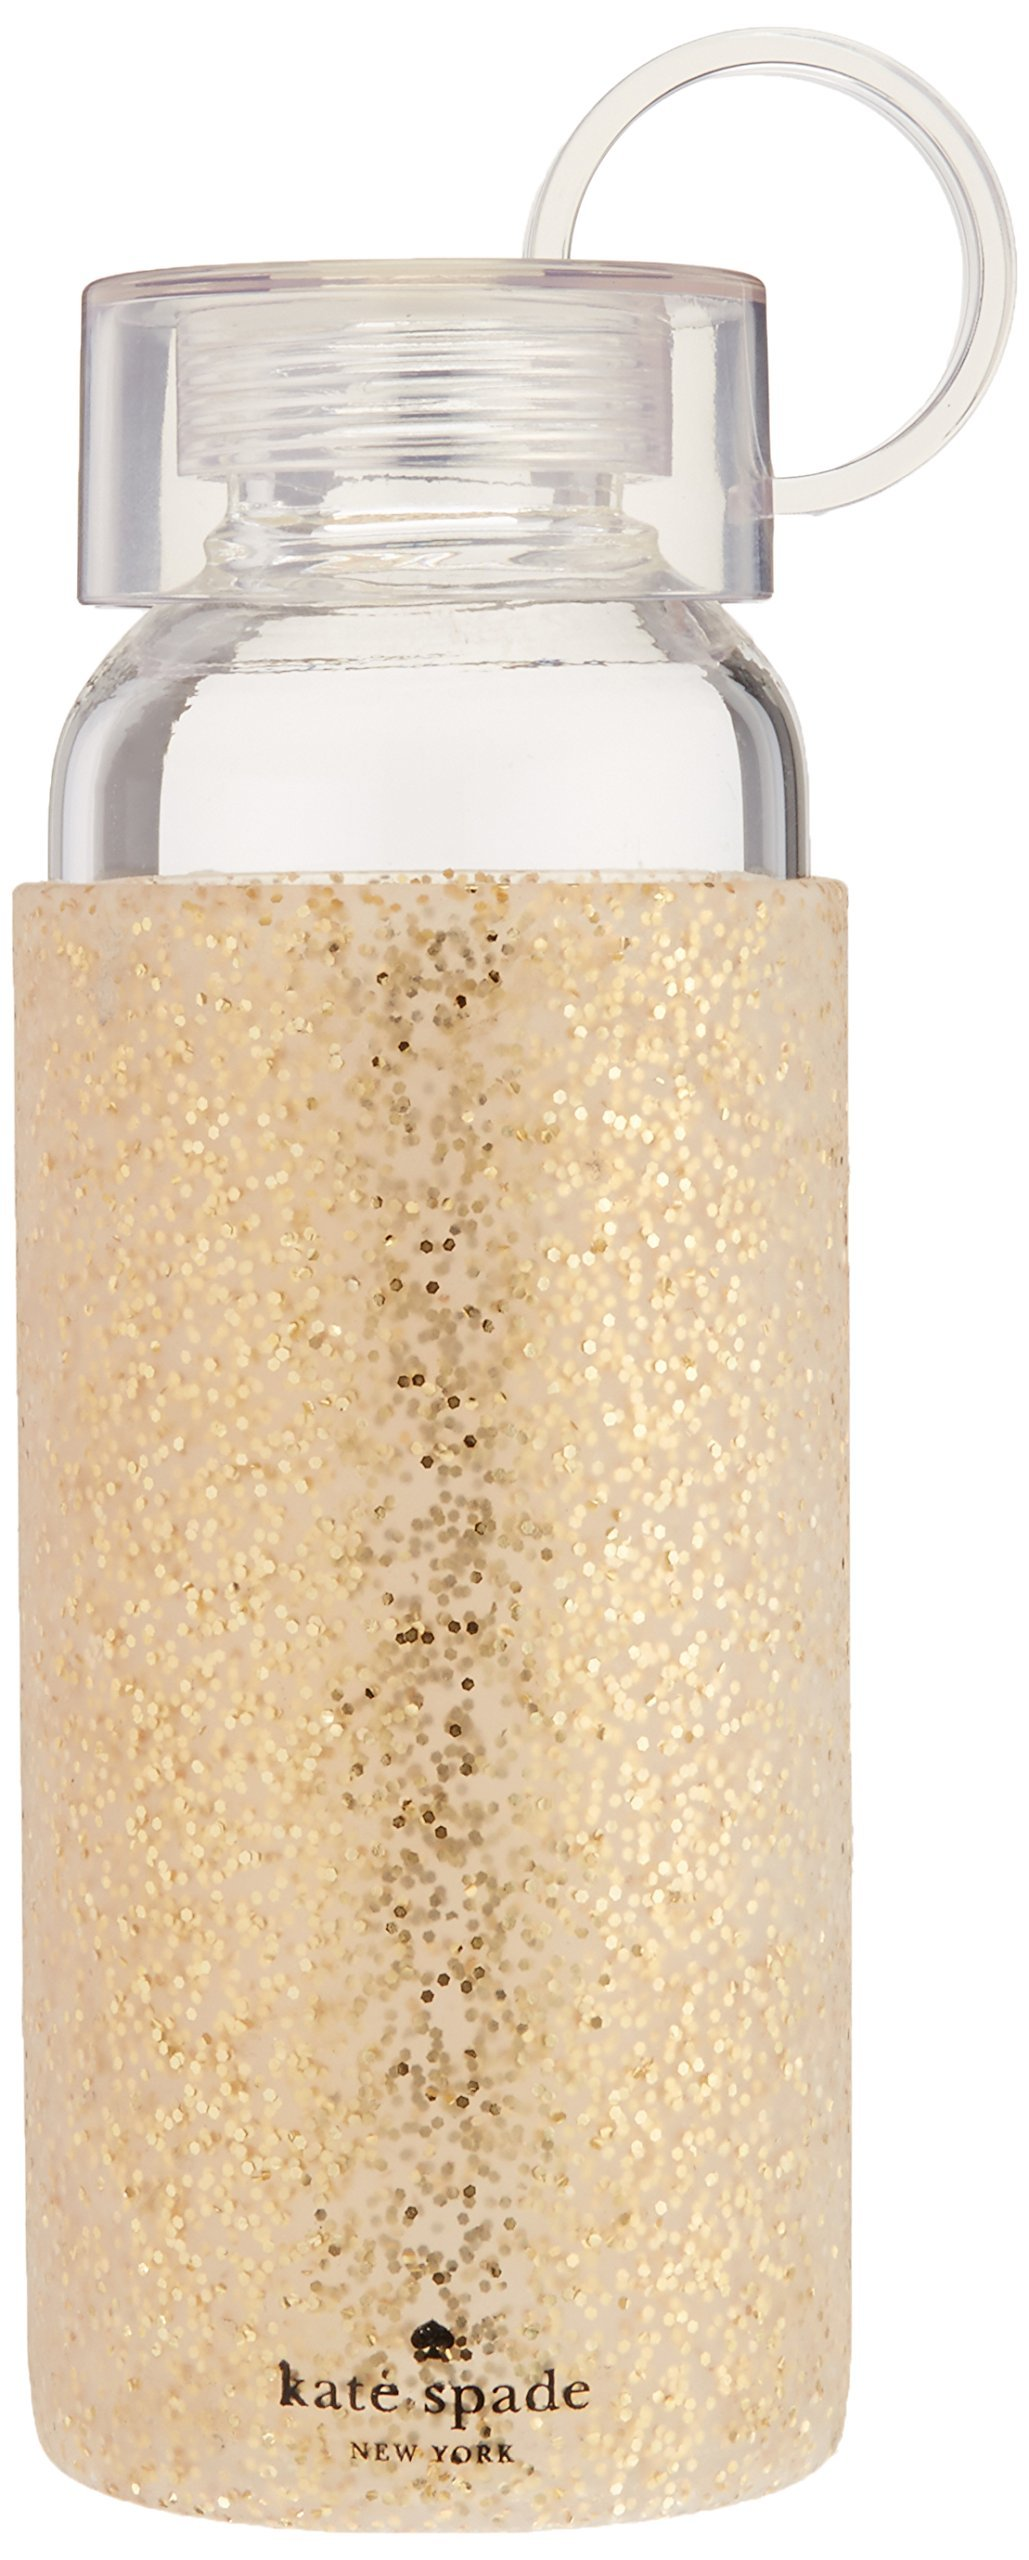 Kate Spade New York Water Bottle, Gold Glitter